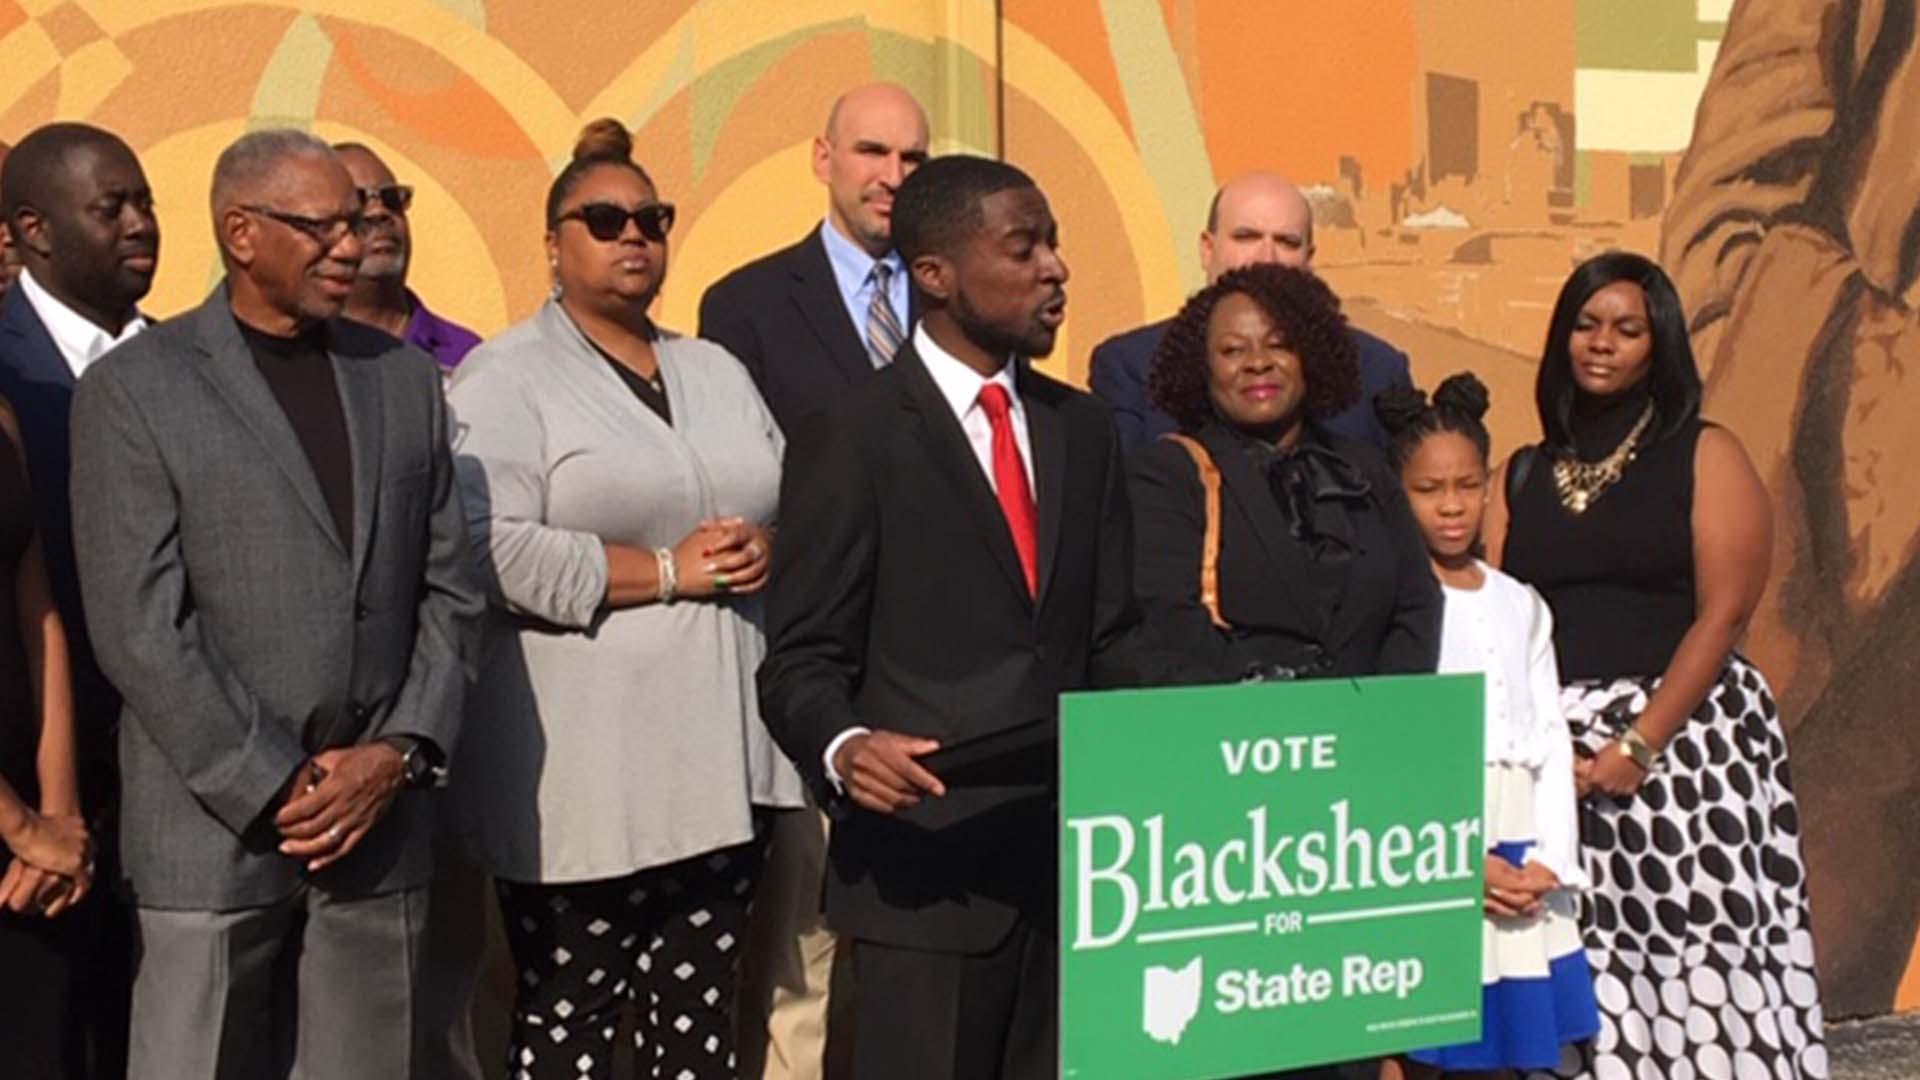 Blackshear announces candidacy